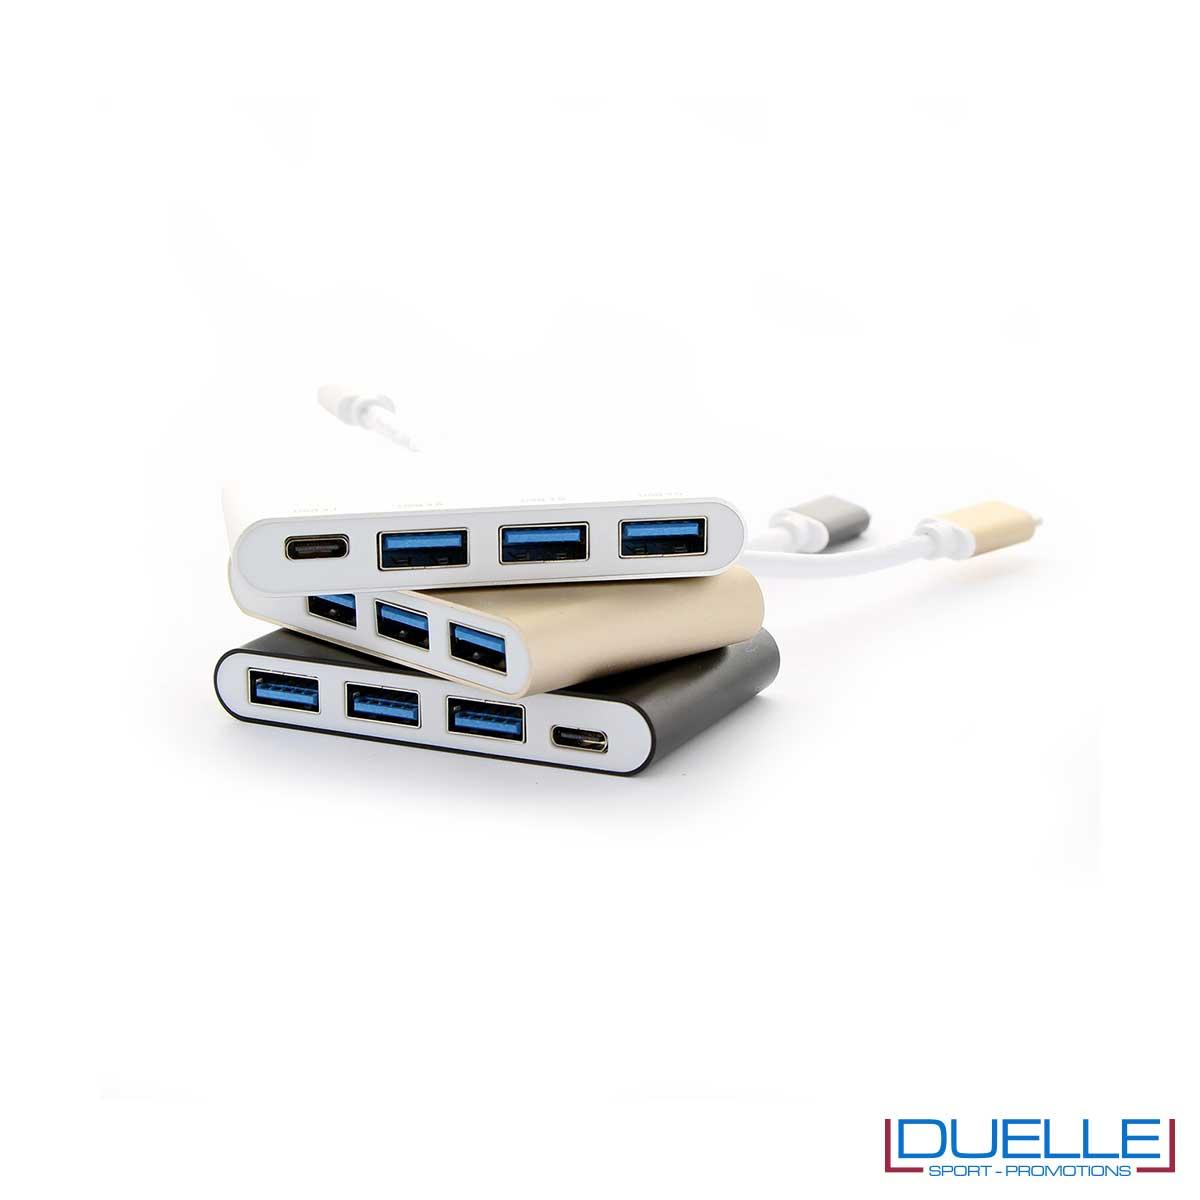 Hub USB-C computer promozionale